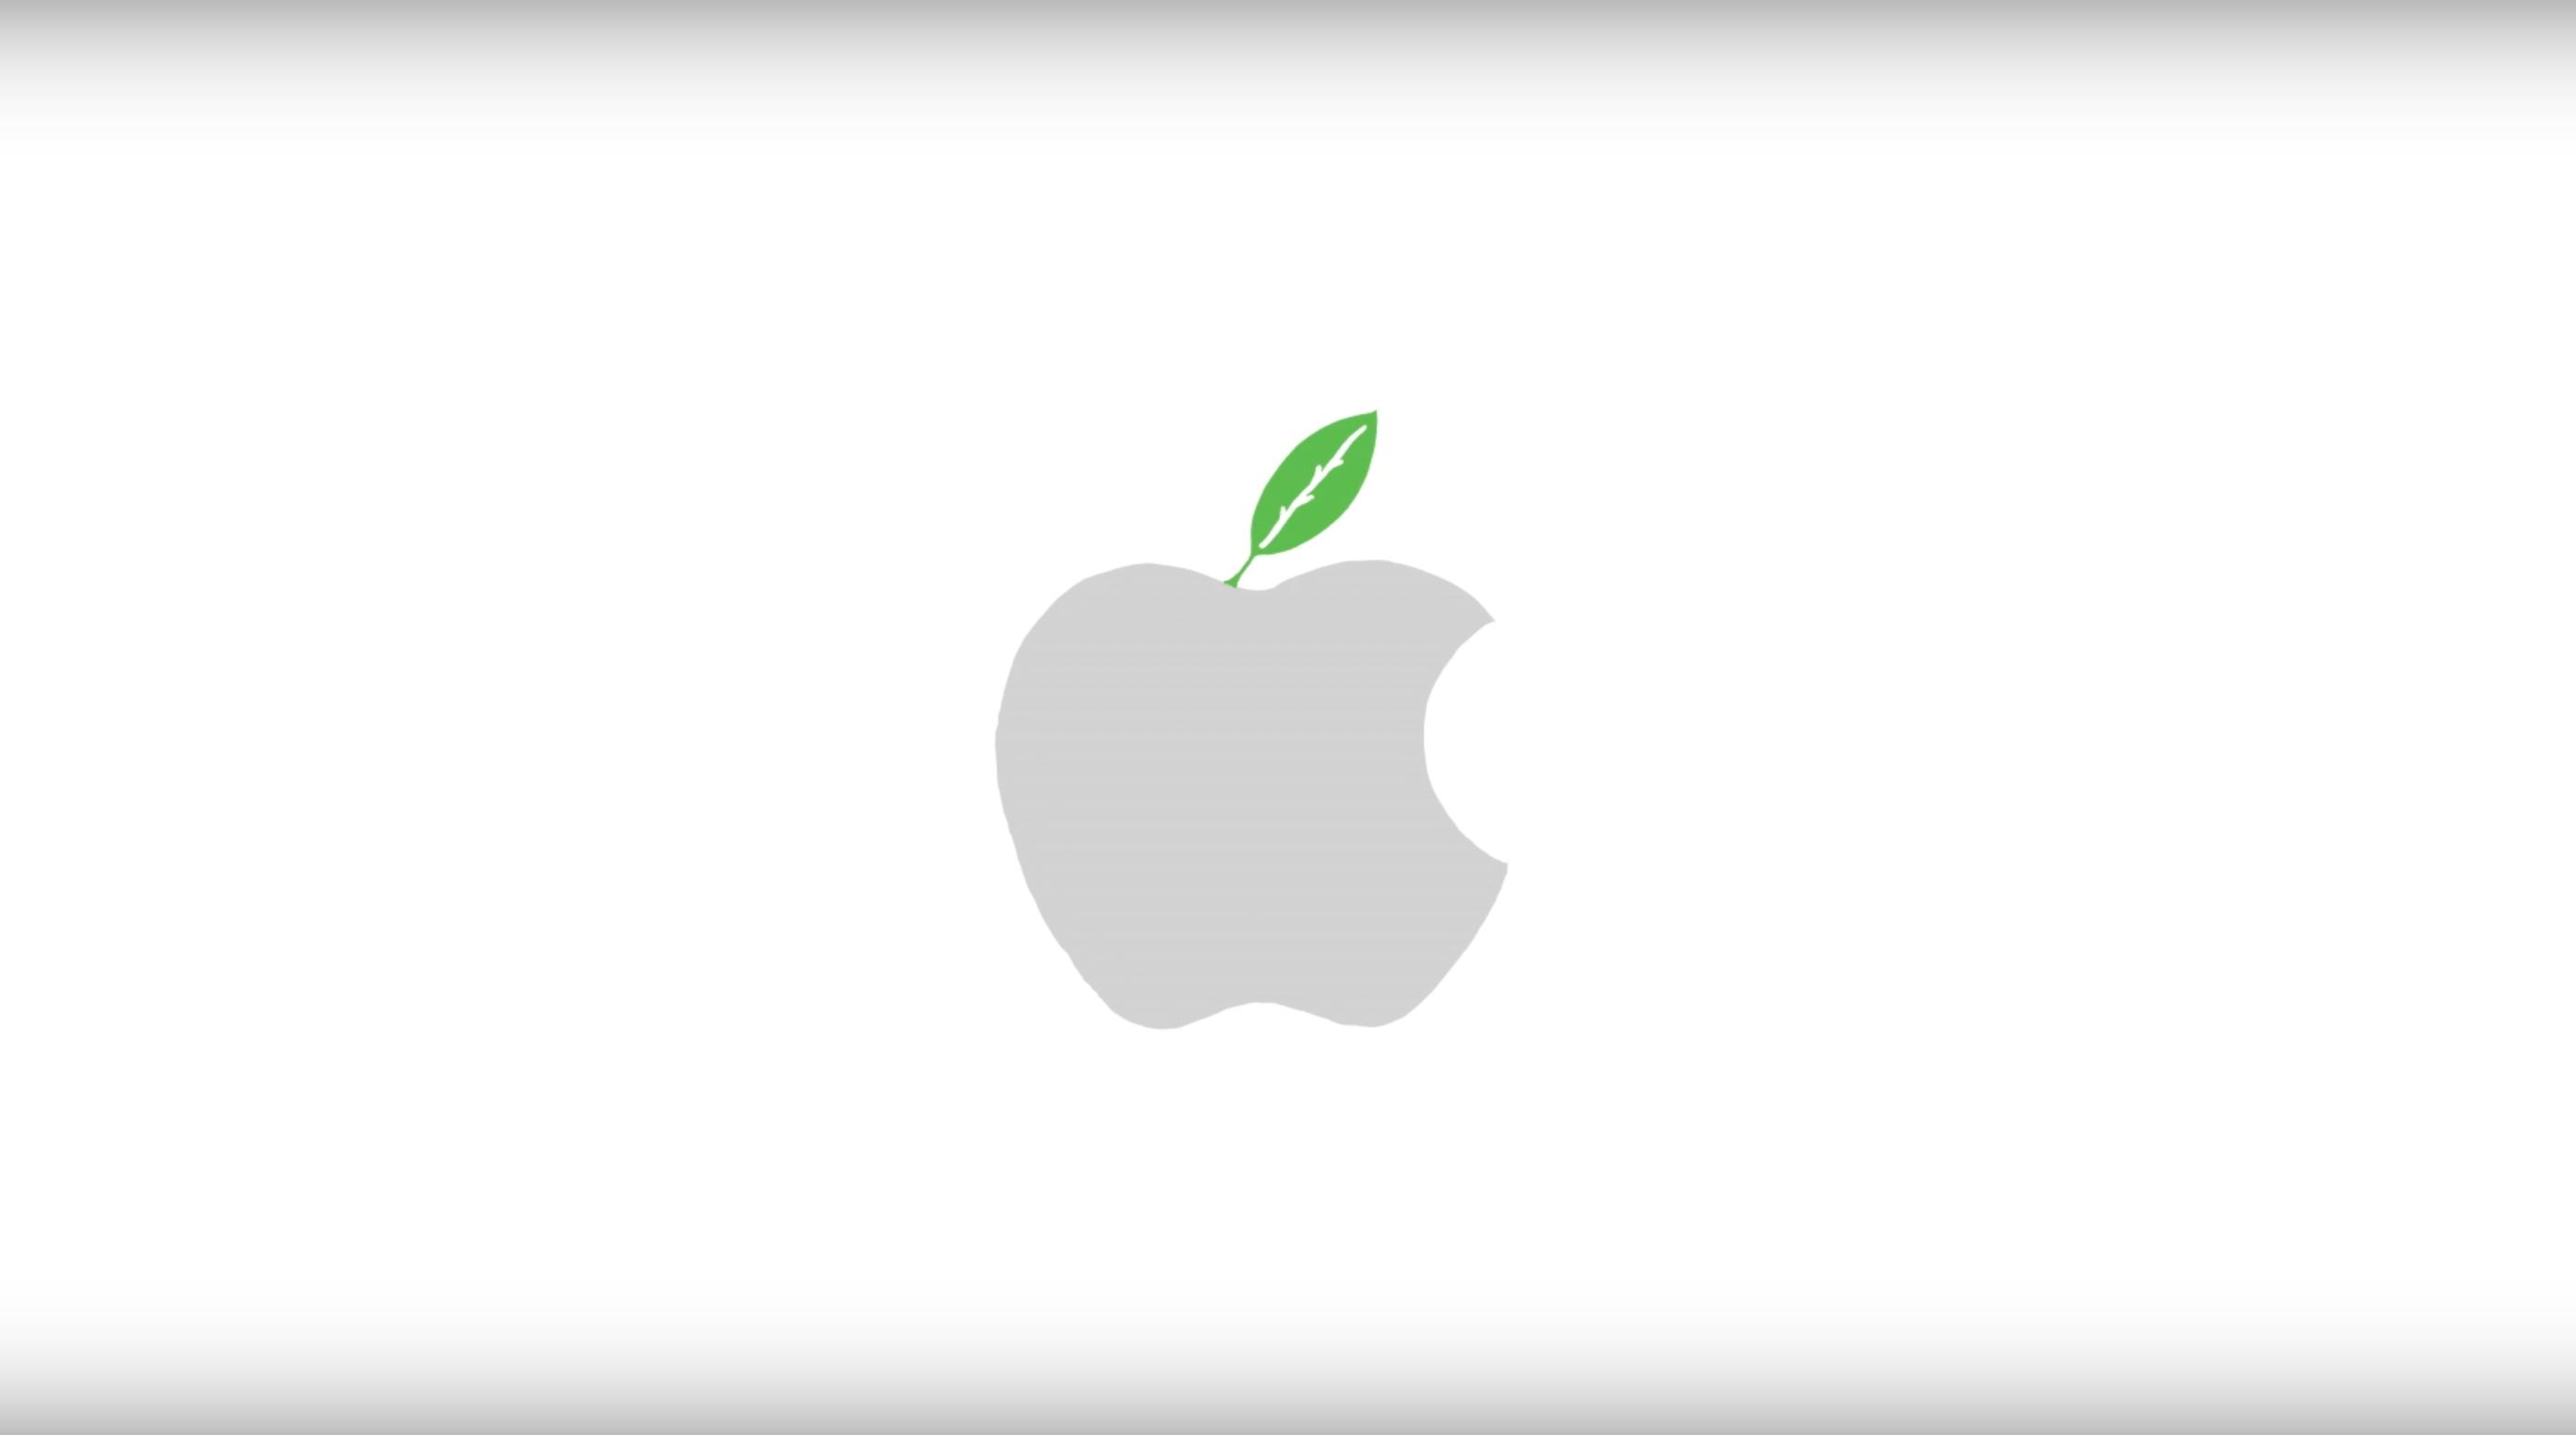 Apple, 지구의 날 기념 TV광고 공개